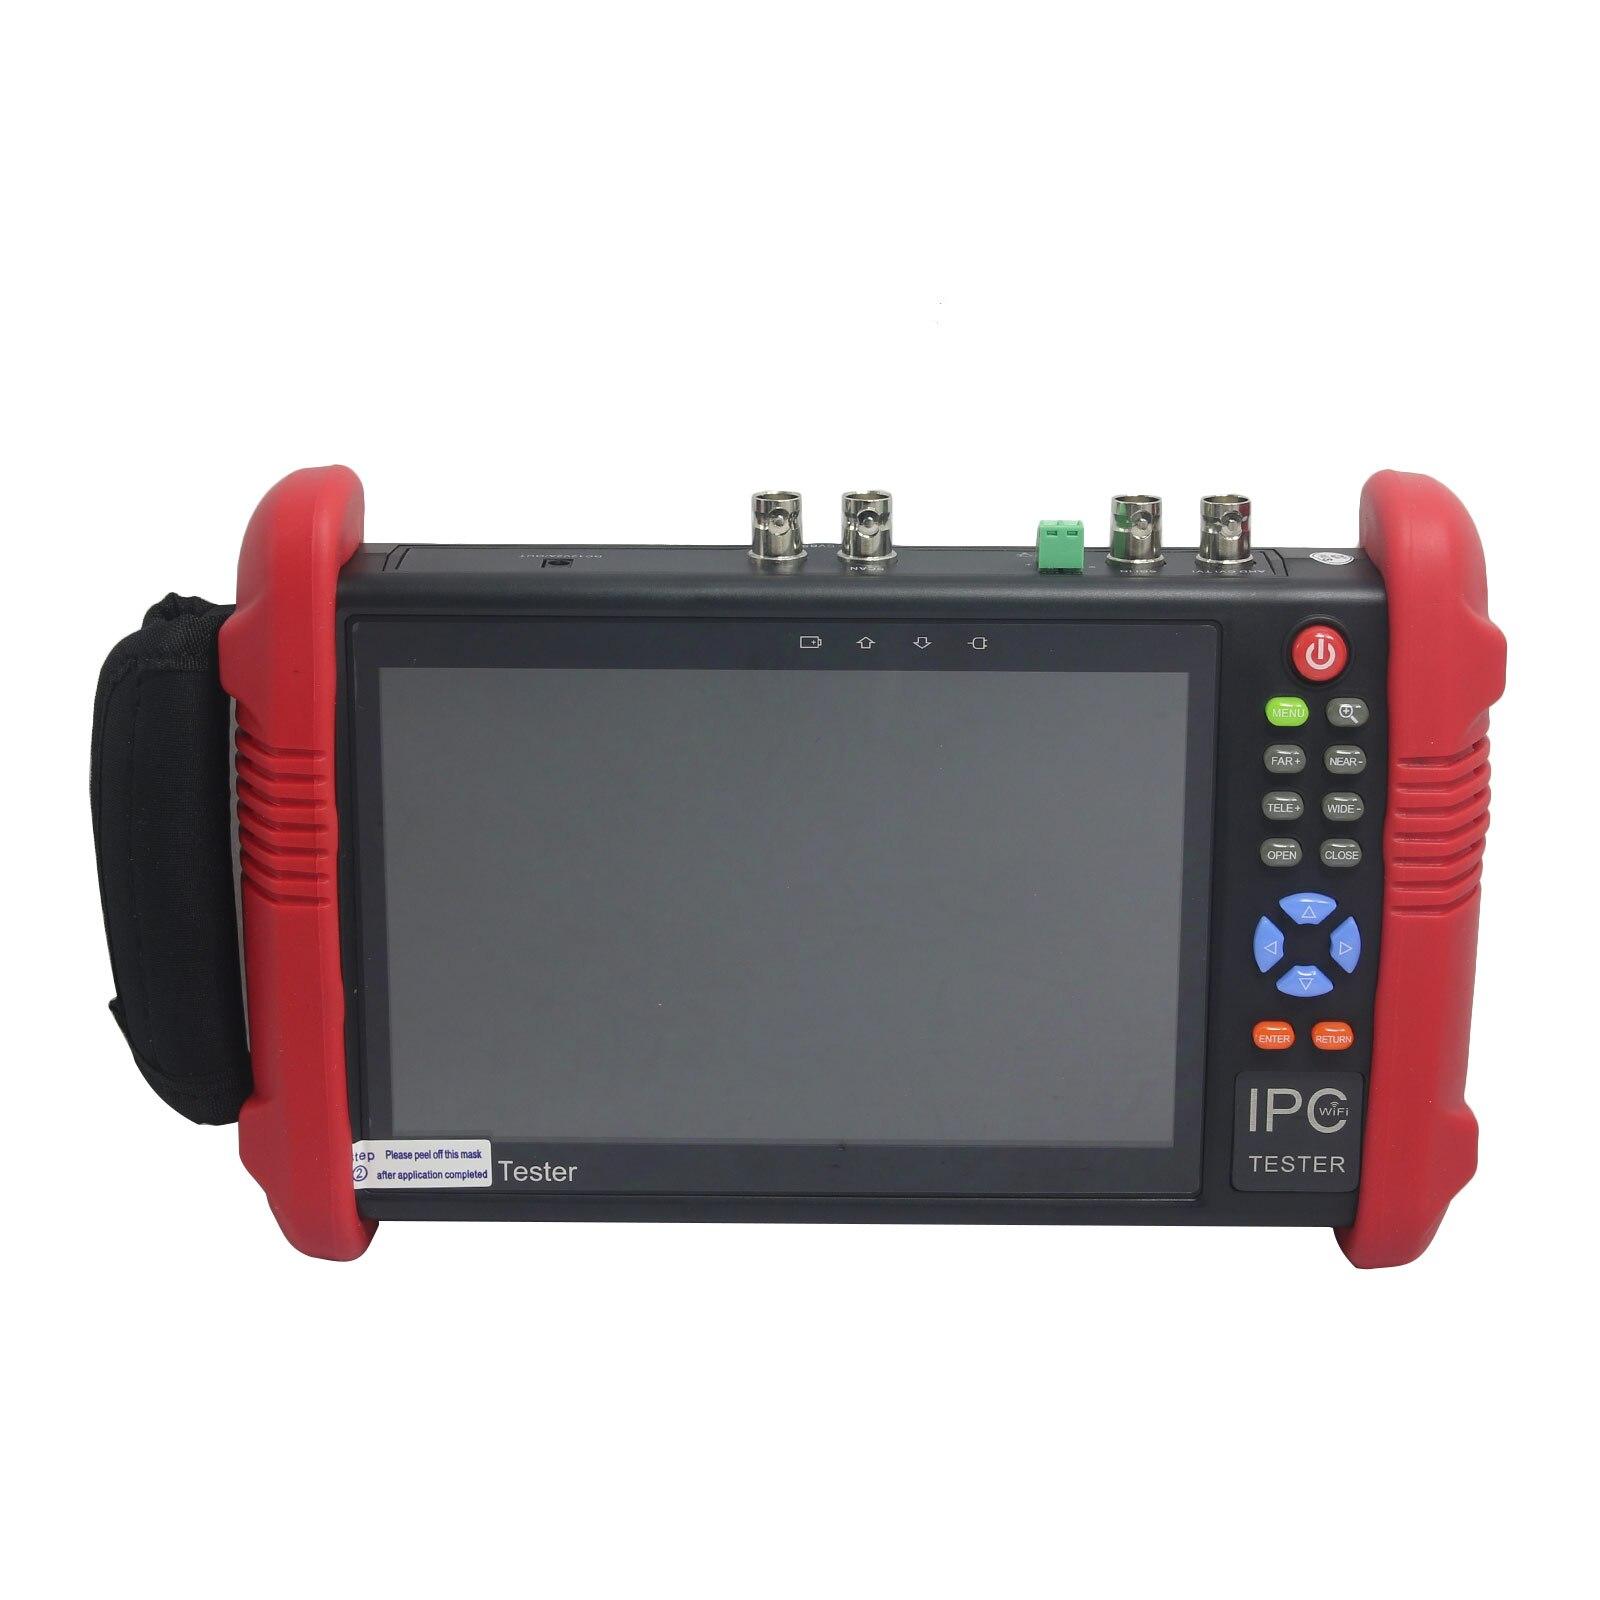 IPC9800ADHS 7 Touch HD 1080P TVI CVI AHD SDI CVBS CCTV IP Camera Monitor Tester miniature size 6 in 1 1080p waterproof bullet mini camera support ahd tvi cvi cvbs hd sdi ex sdi for bank army prison